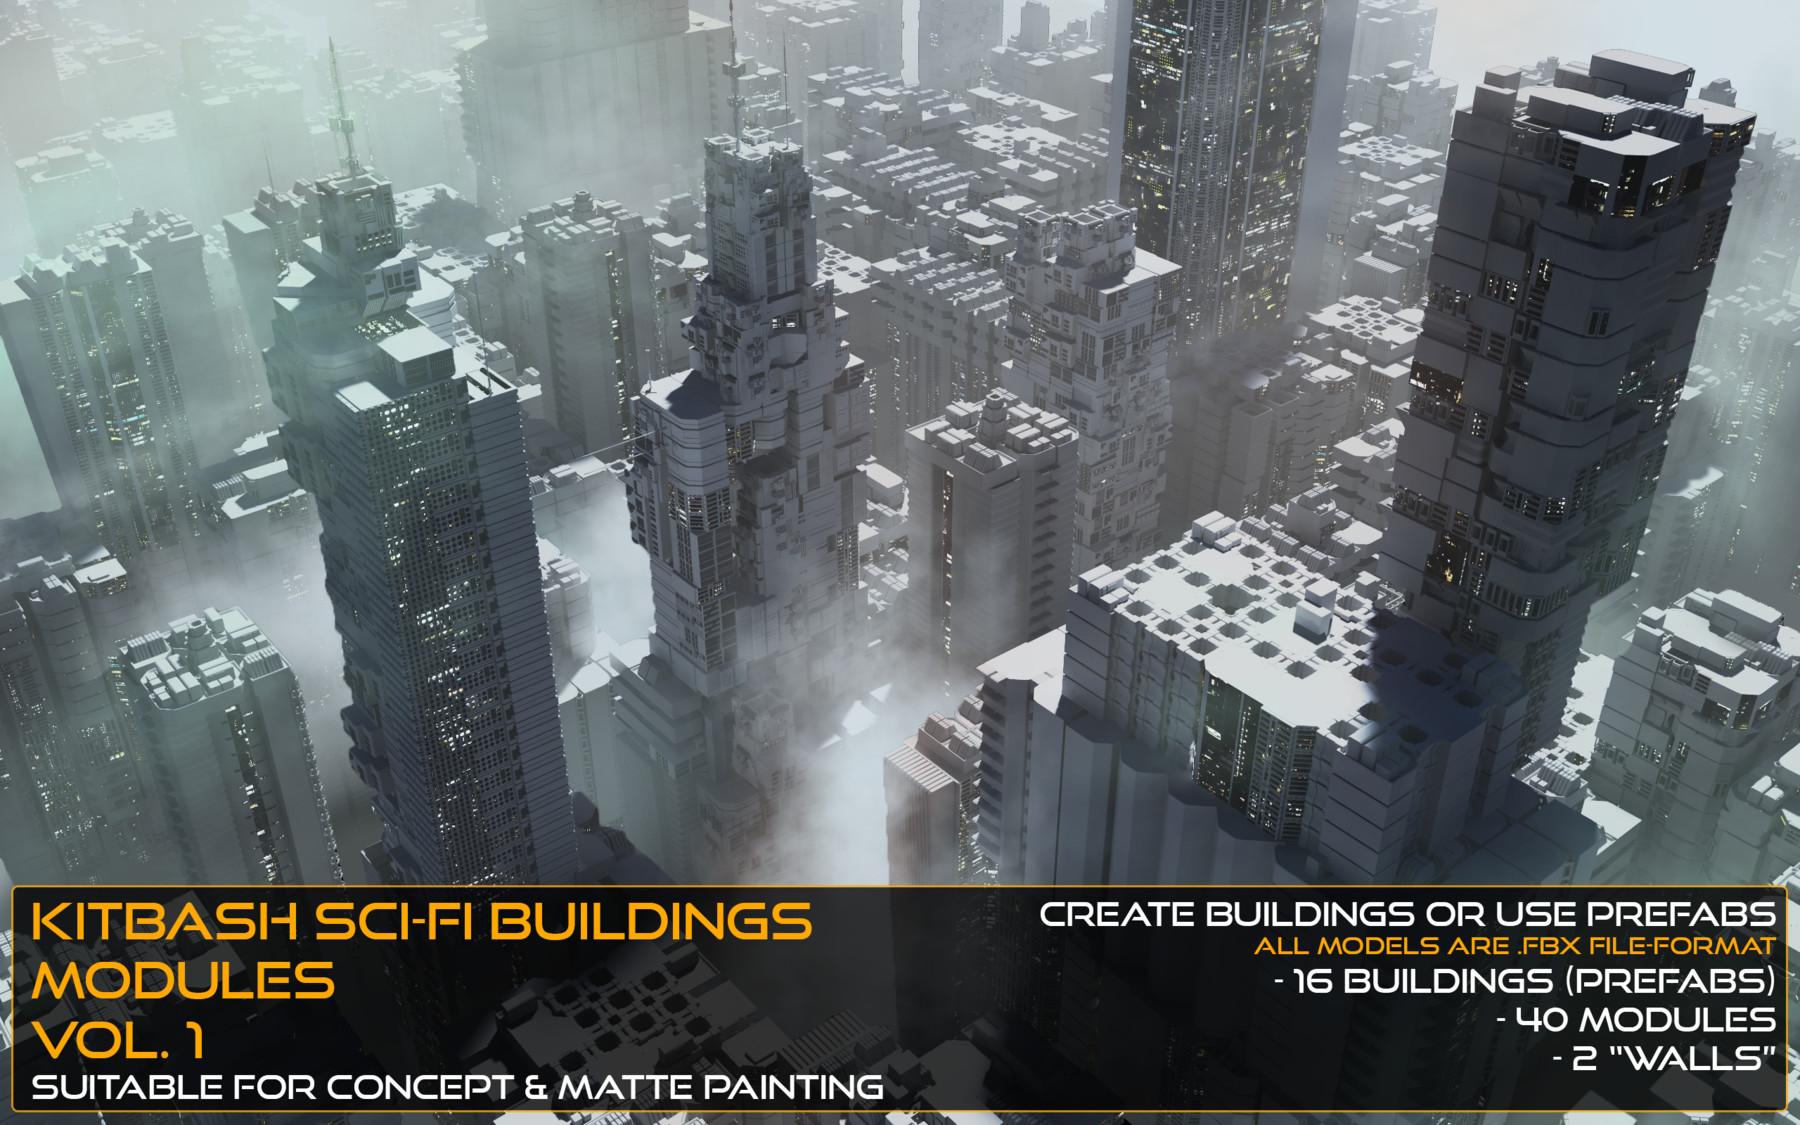 Erik Wadstein - Kitbash Sci-fi Buildings & Modules Vol 1